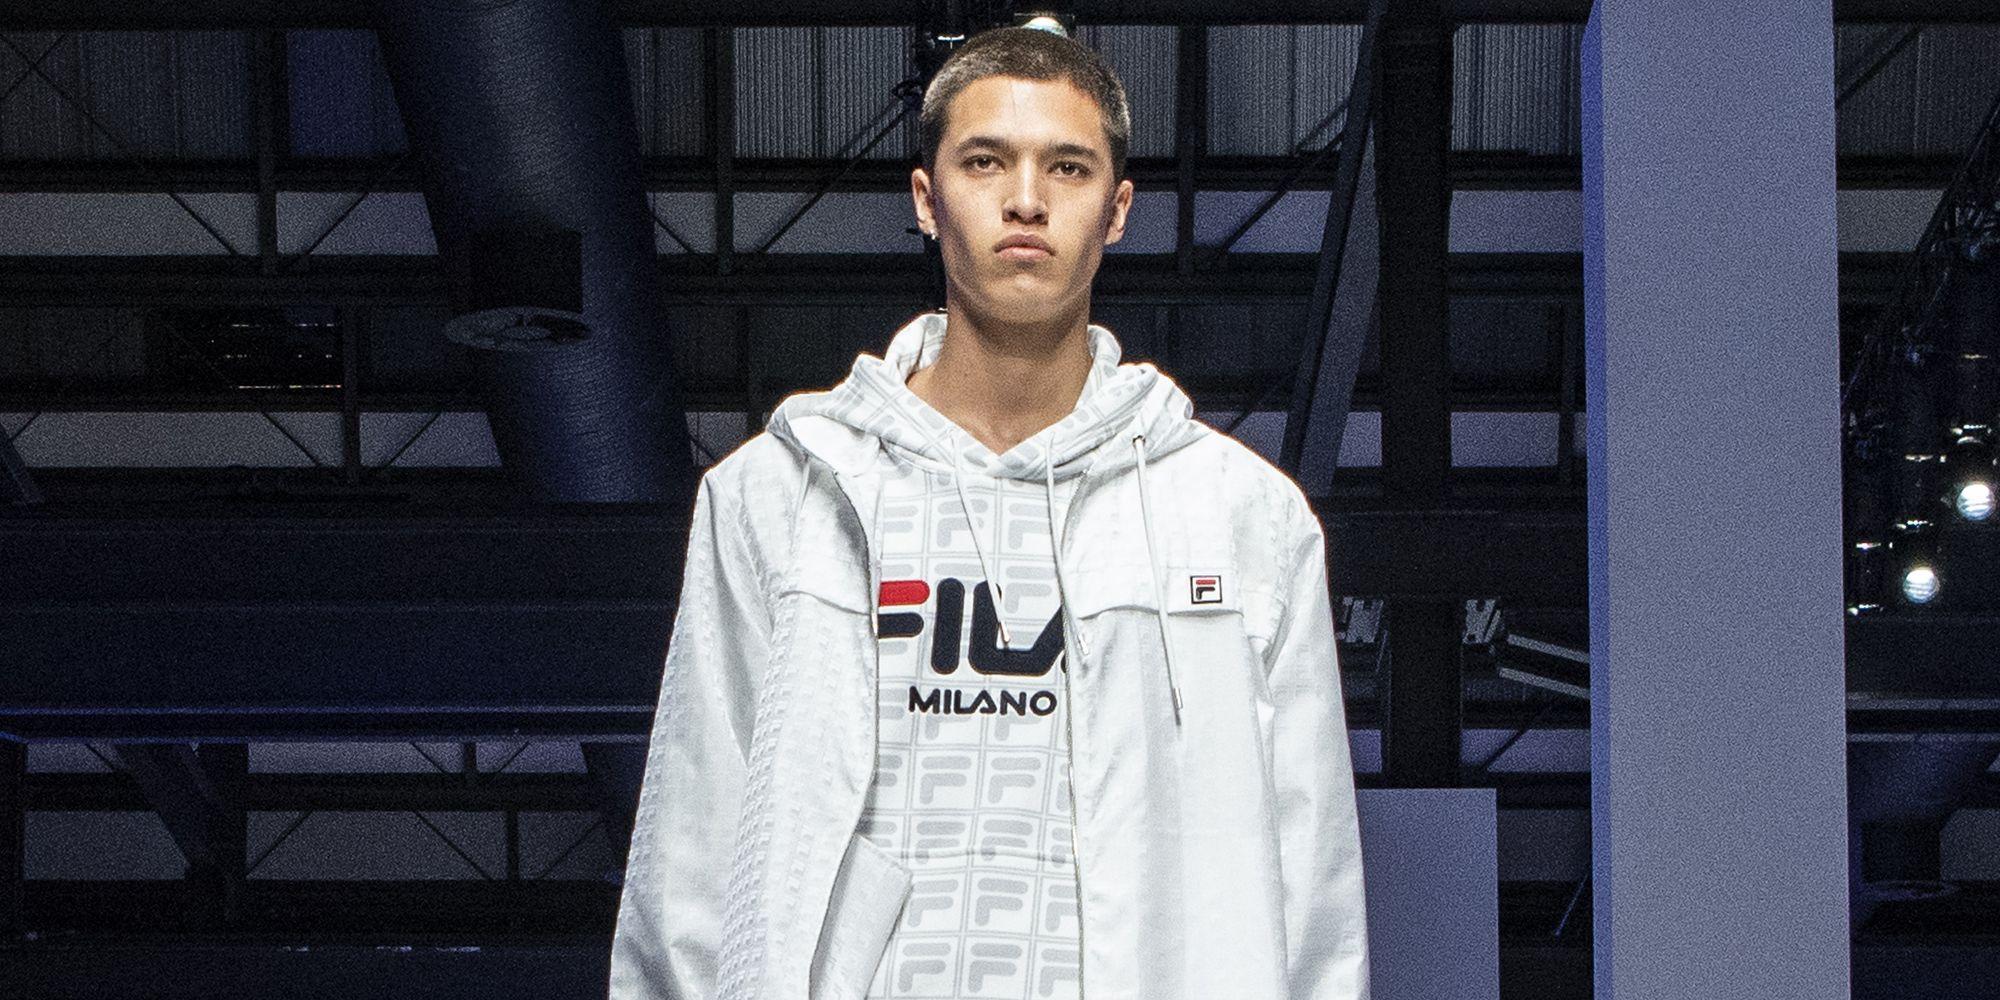 Moda uomo inverno 2017 2018 influenze sportswear hoodie